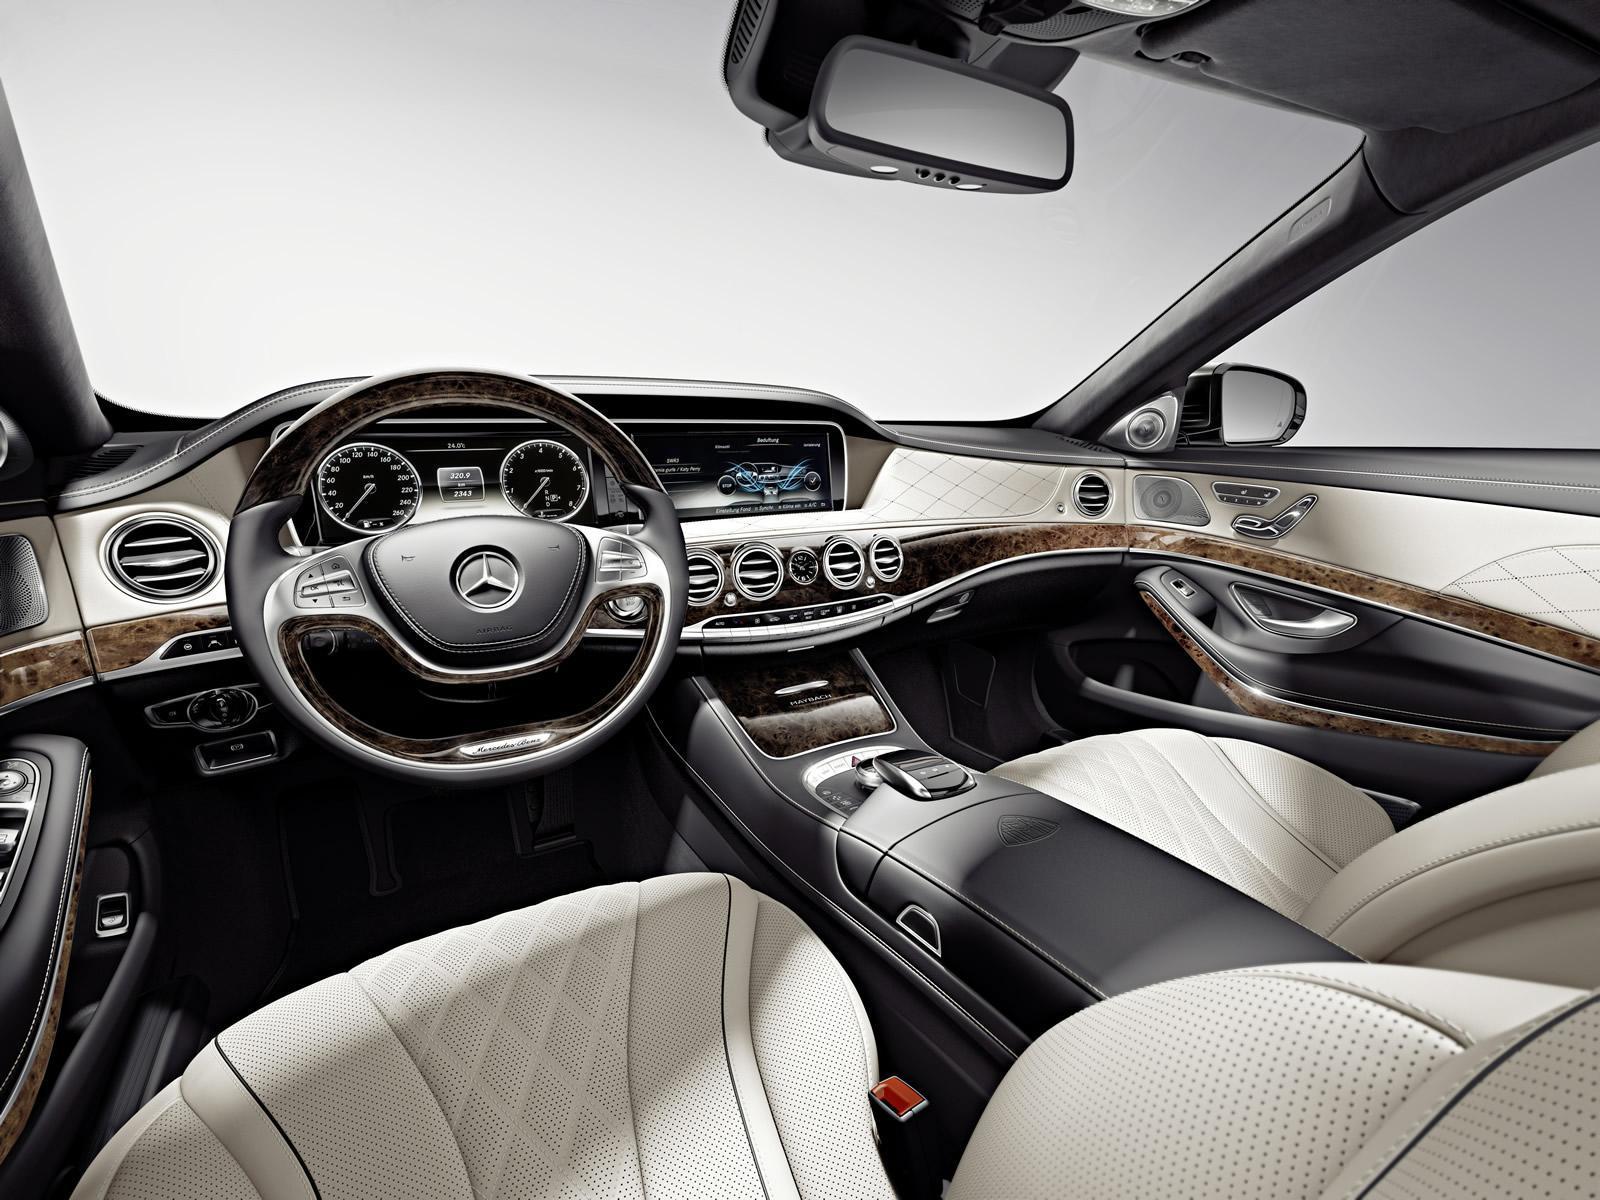 Foto de Mercedes-Benz Clase S Maybach (38/38)